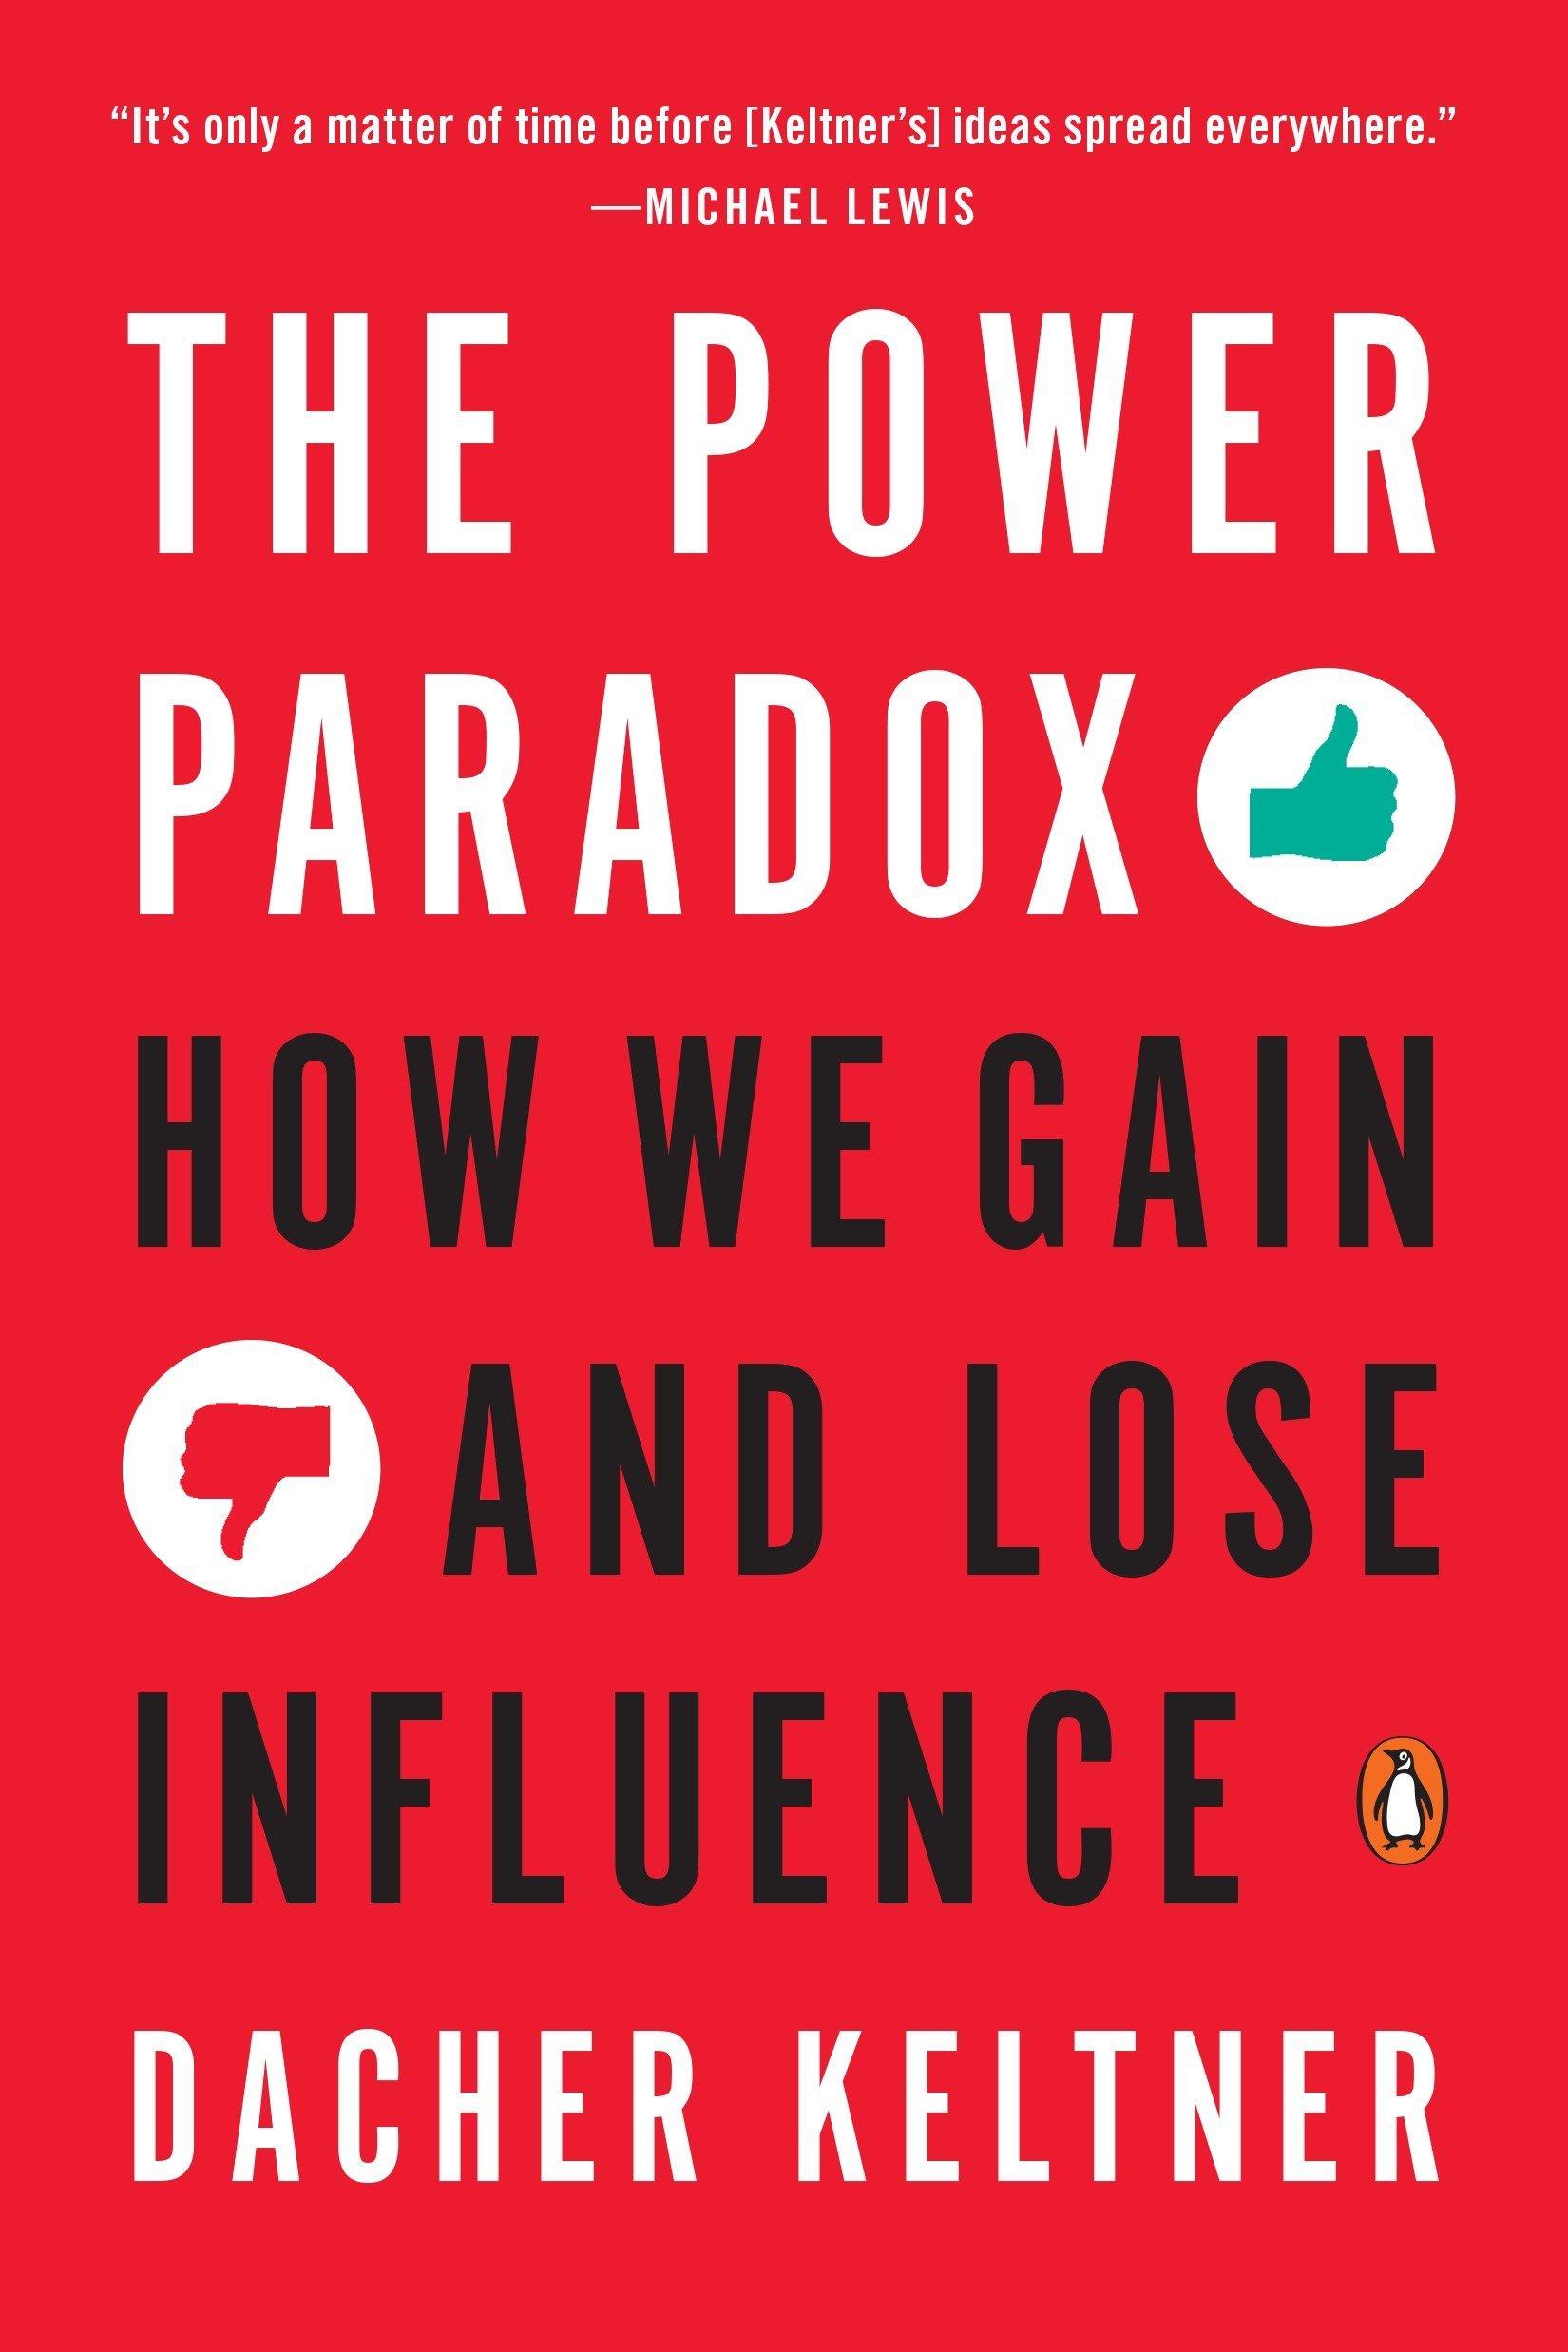 power paradox.jpg